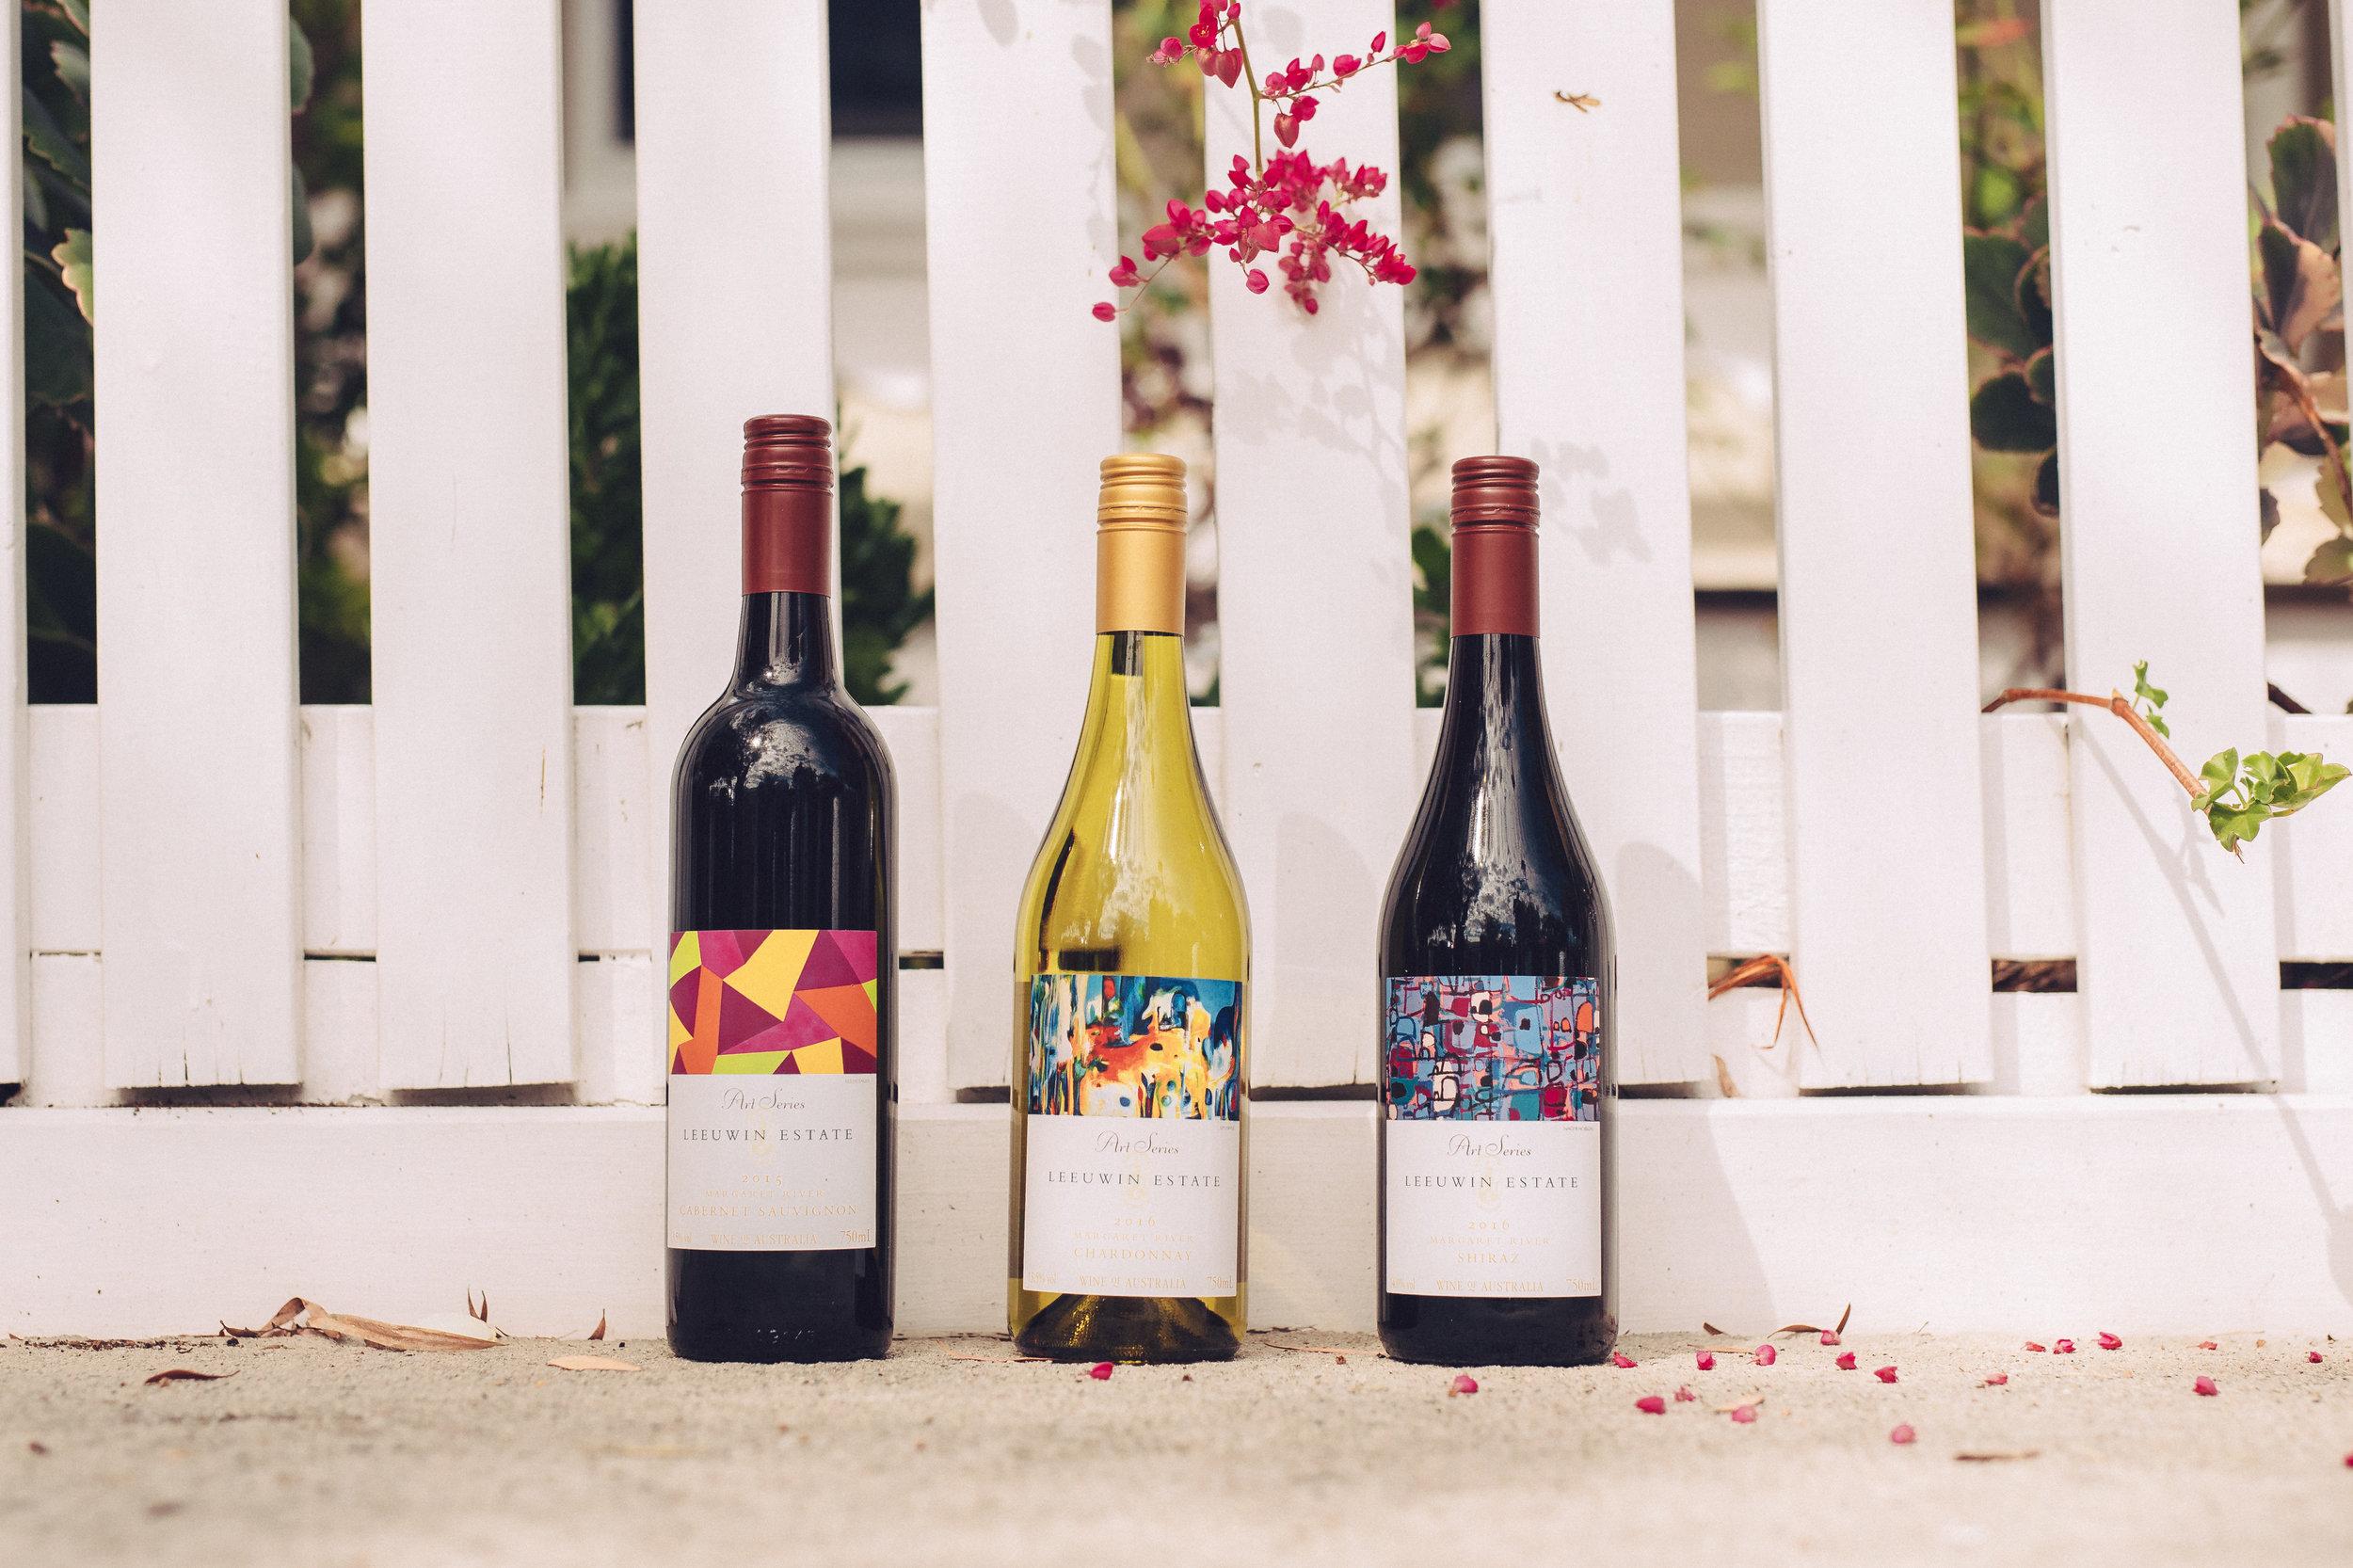 Leeuwin Art Series Cabernet Sauvignon 2015, Chardonnay 2016 and Shiraz2016